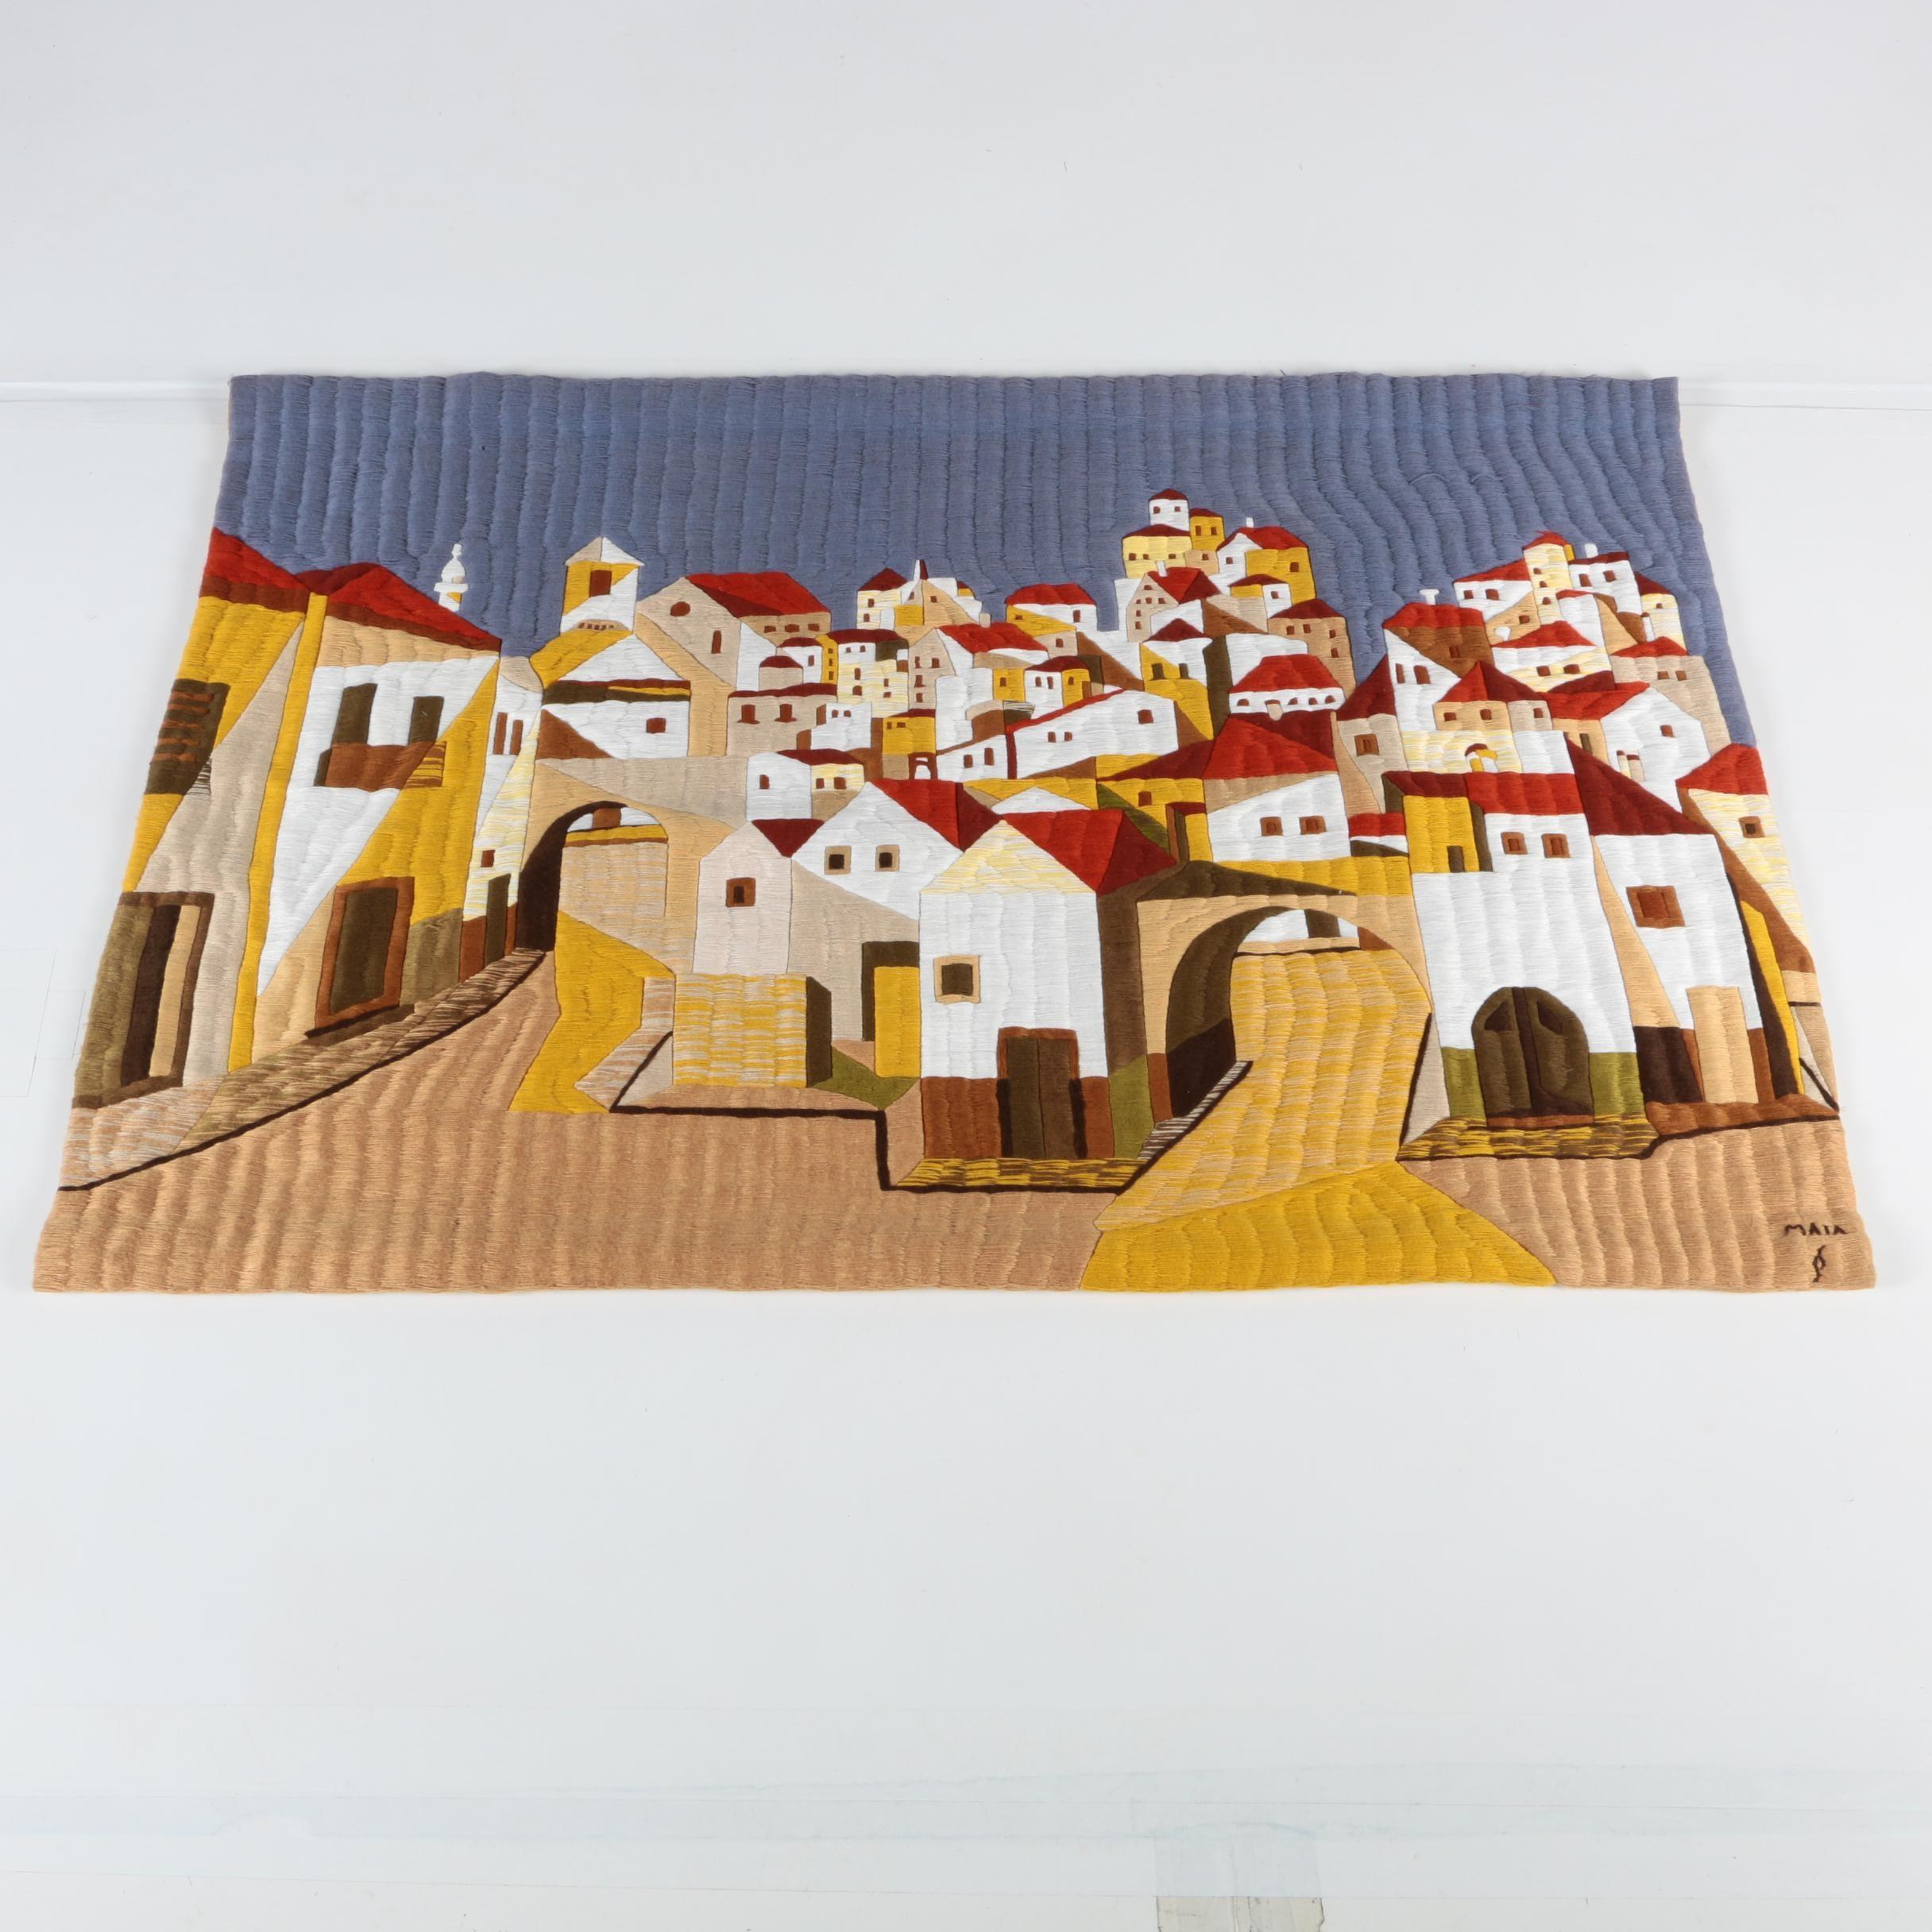 "Handmade Tapestry ""Casas Portuguesas No. 3"" by Abel Maia"